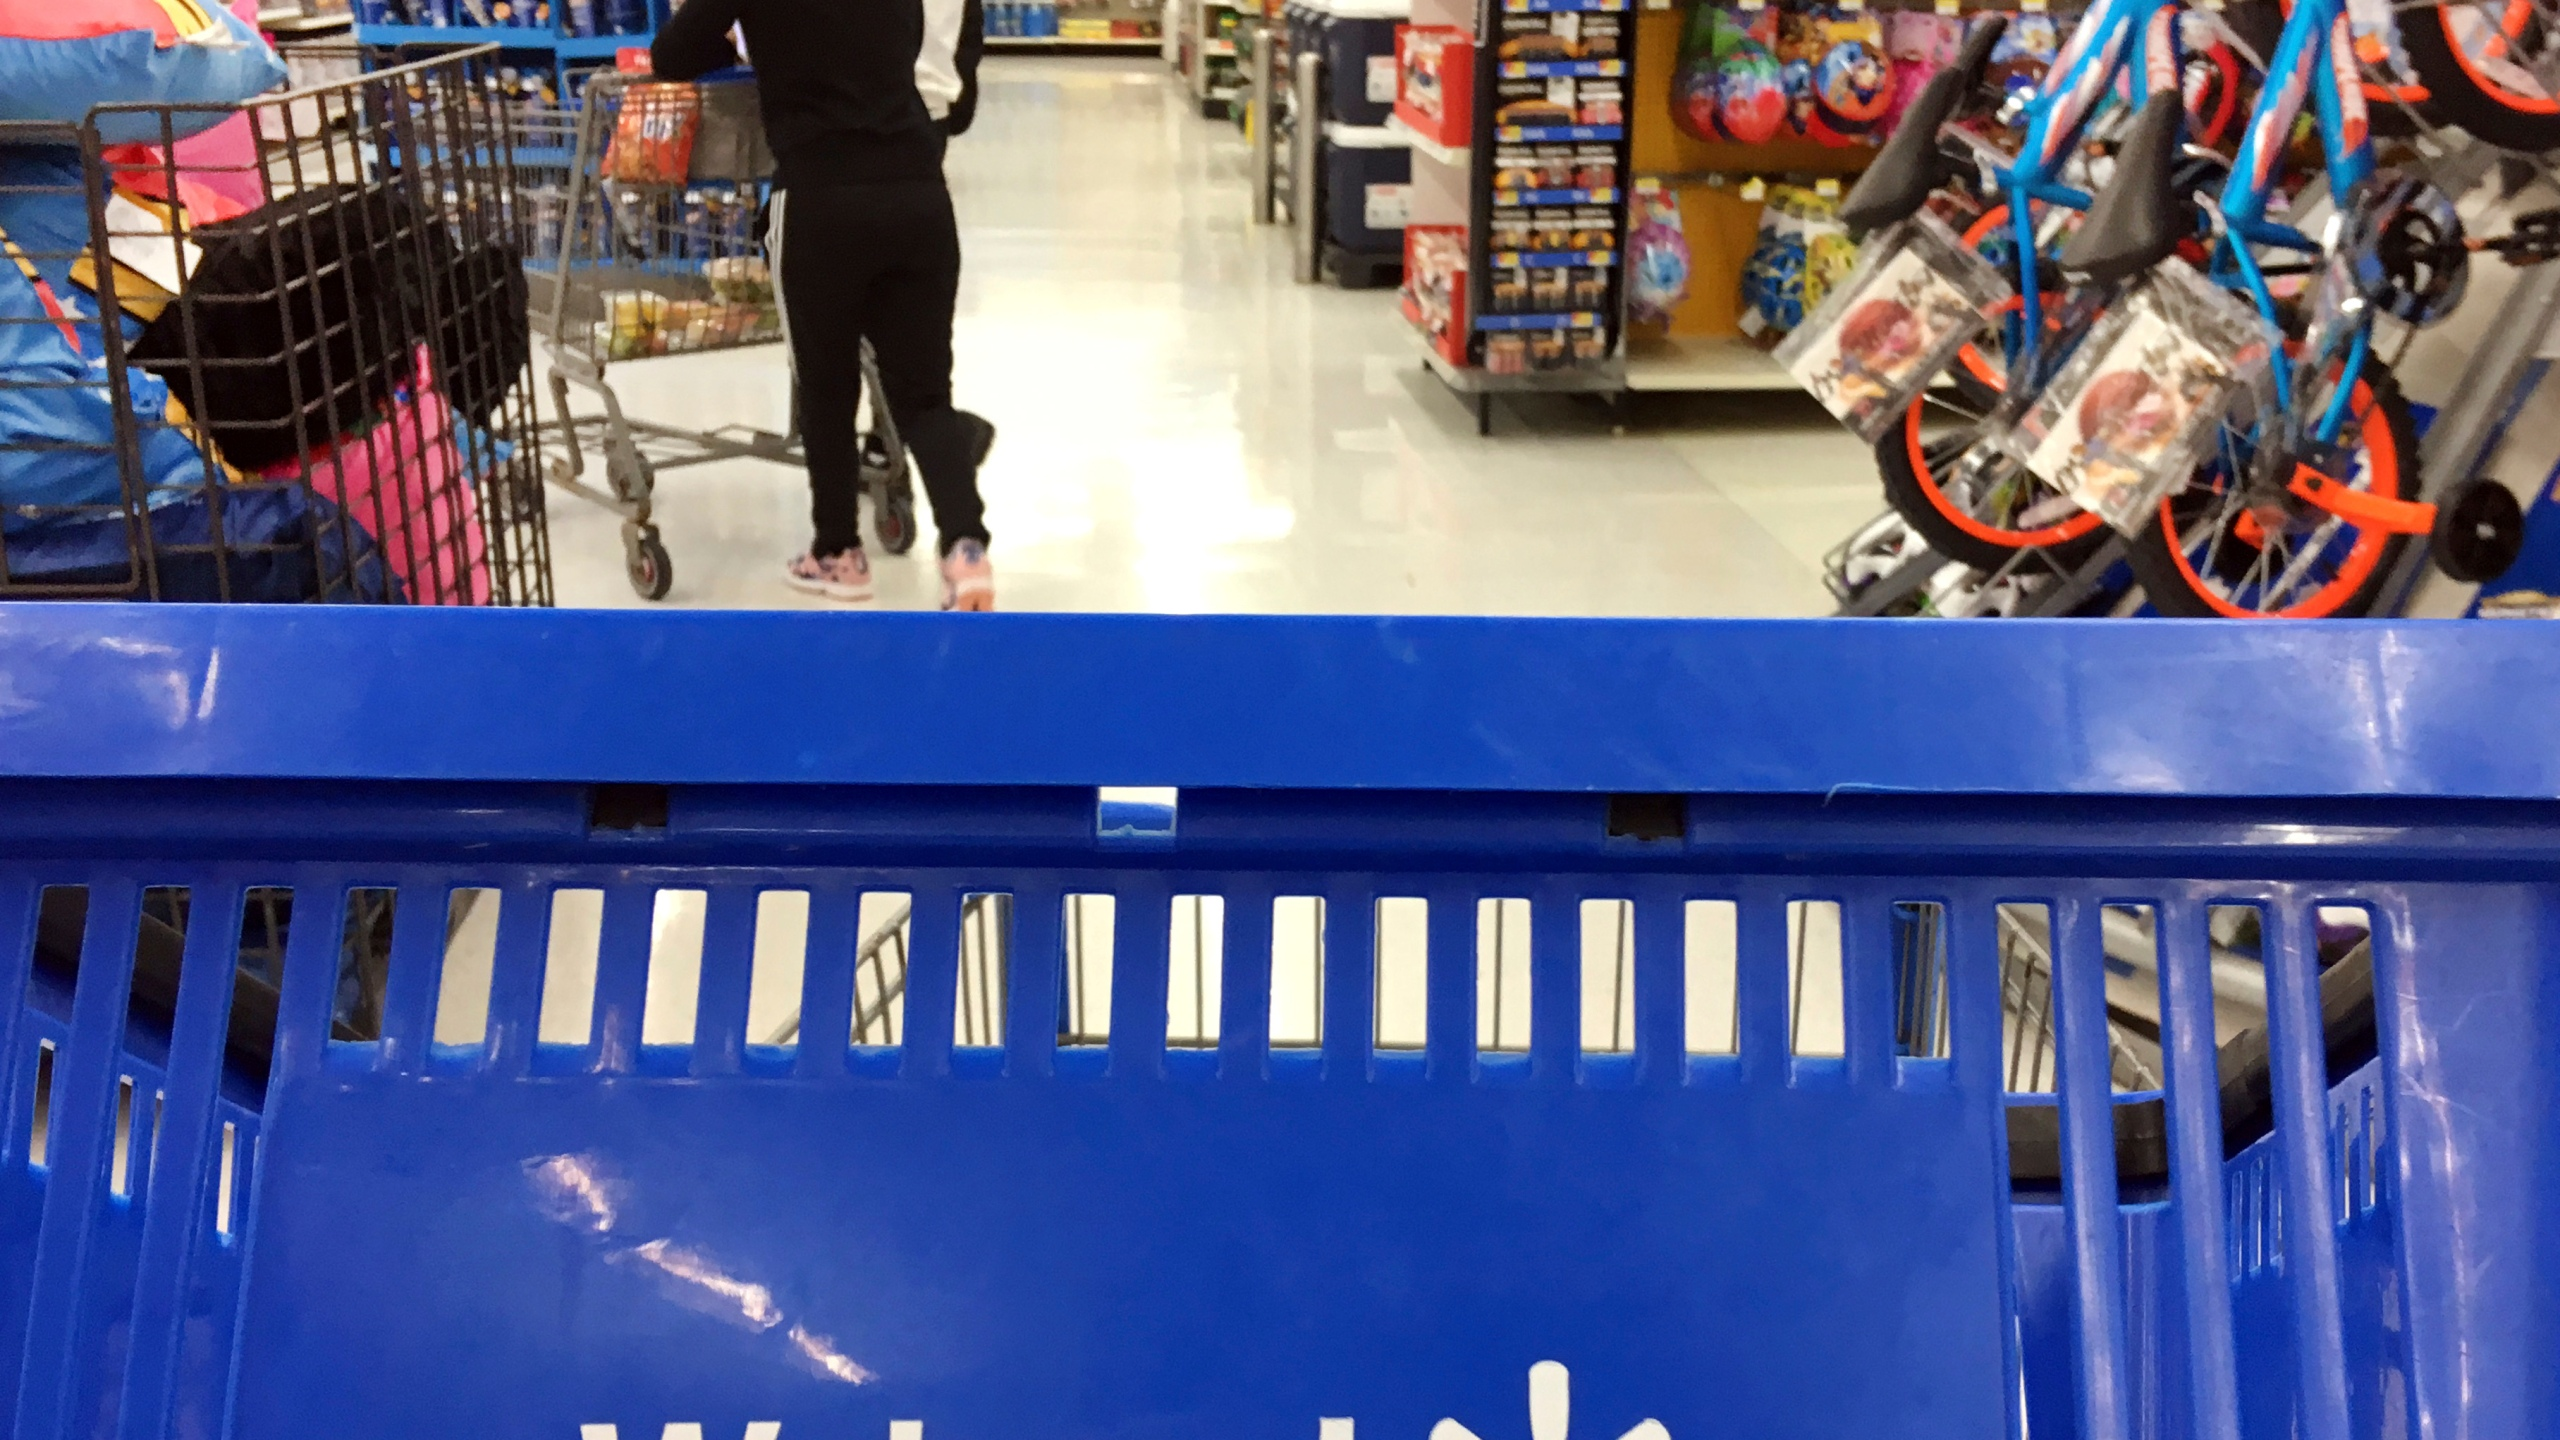 Walmart_Gun_Policy_50045-159532.jpg29373538